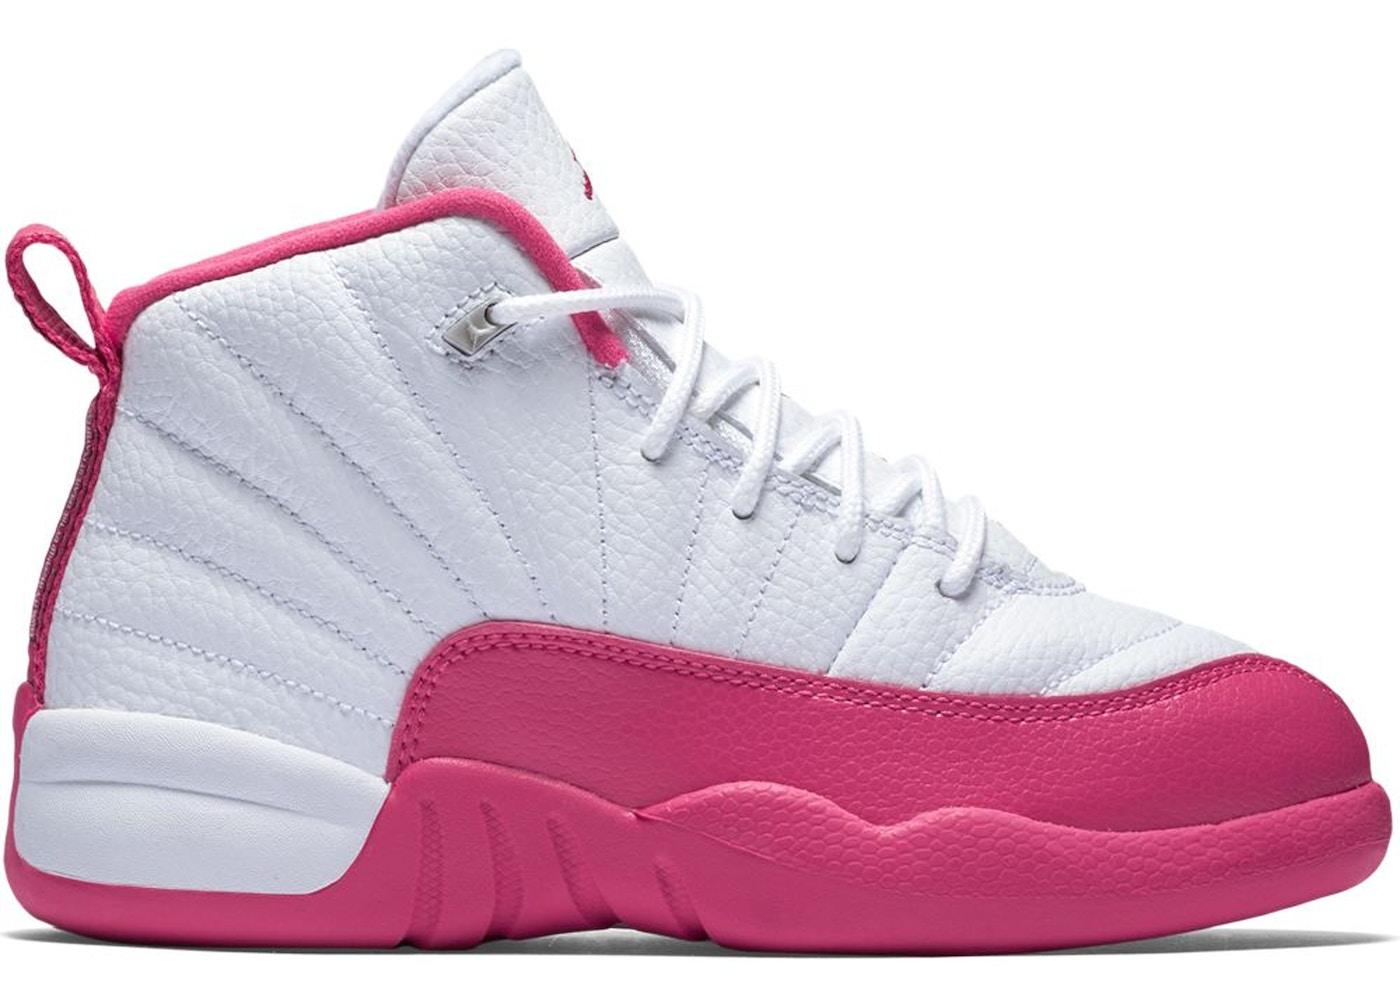 sale retailer 65391 8fd0a Air Jordan 12 Shoes - Price Premium